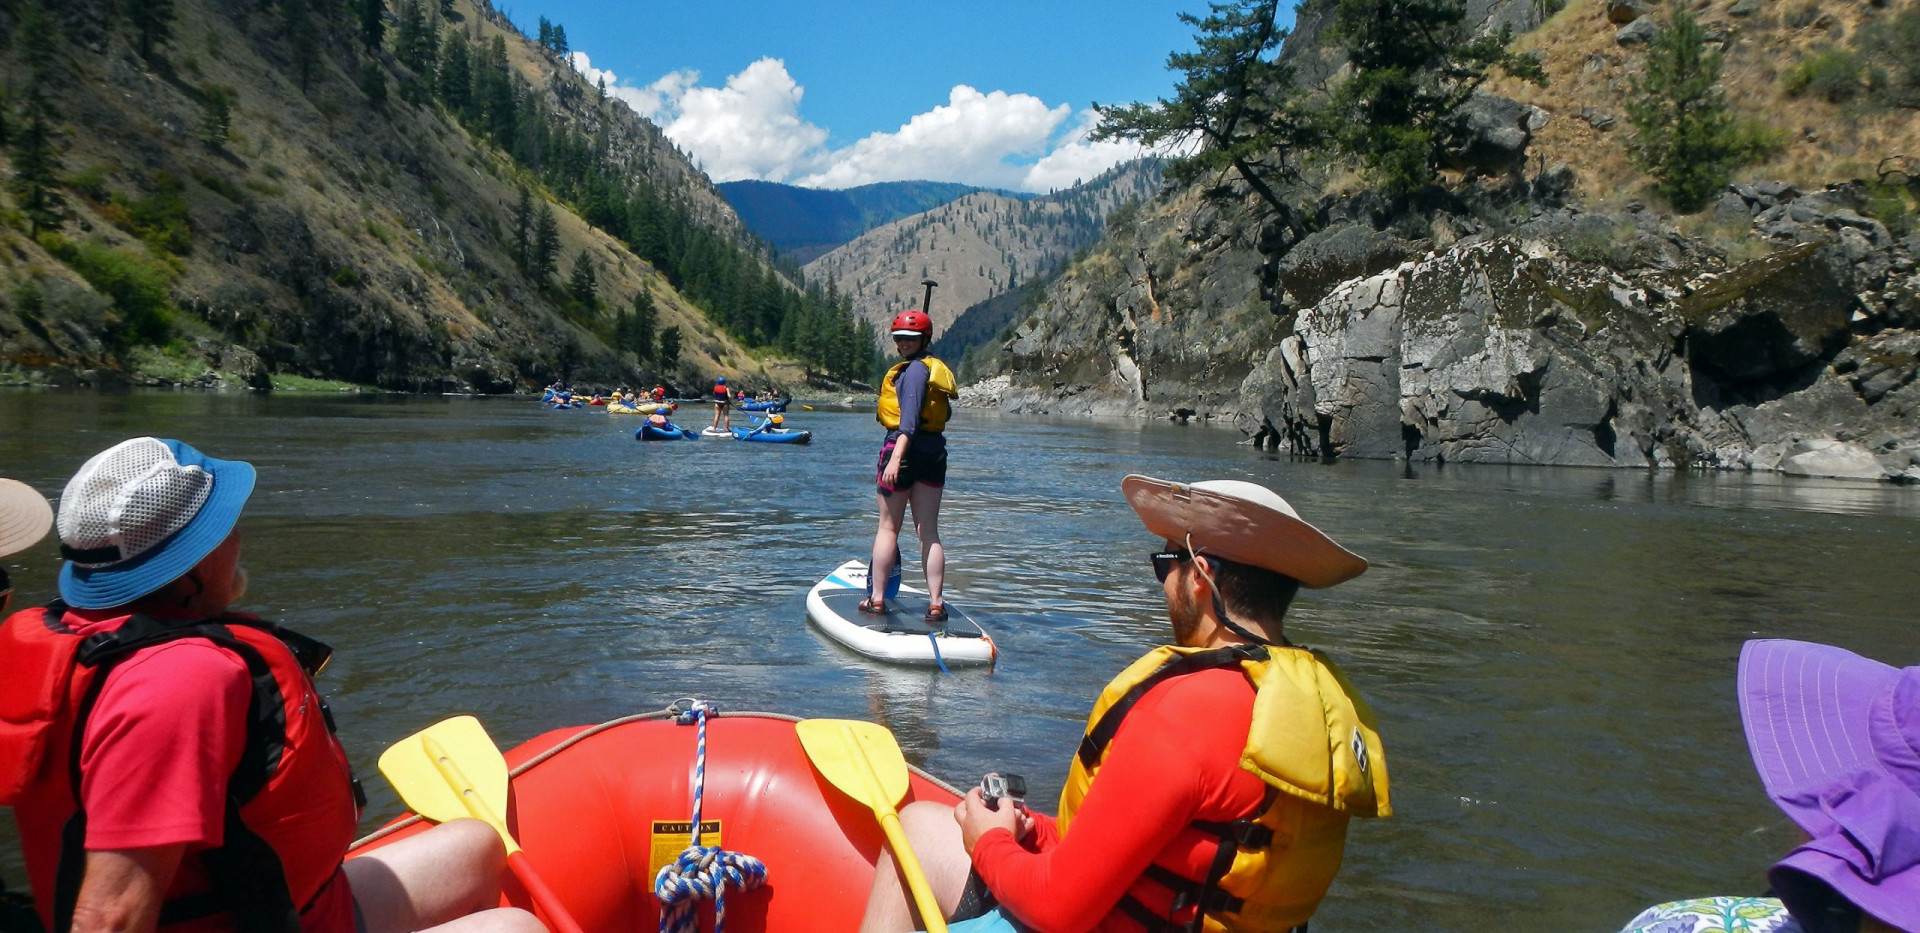 SUP - Family Rafting - Idaho Salmon River